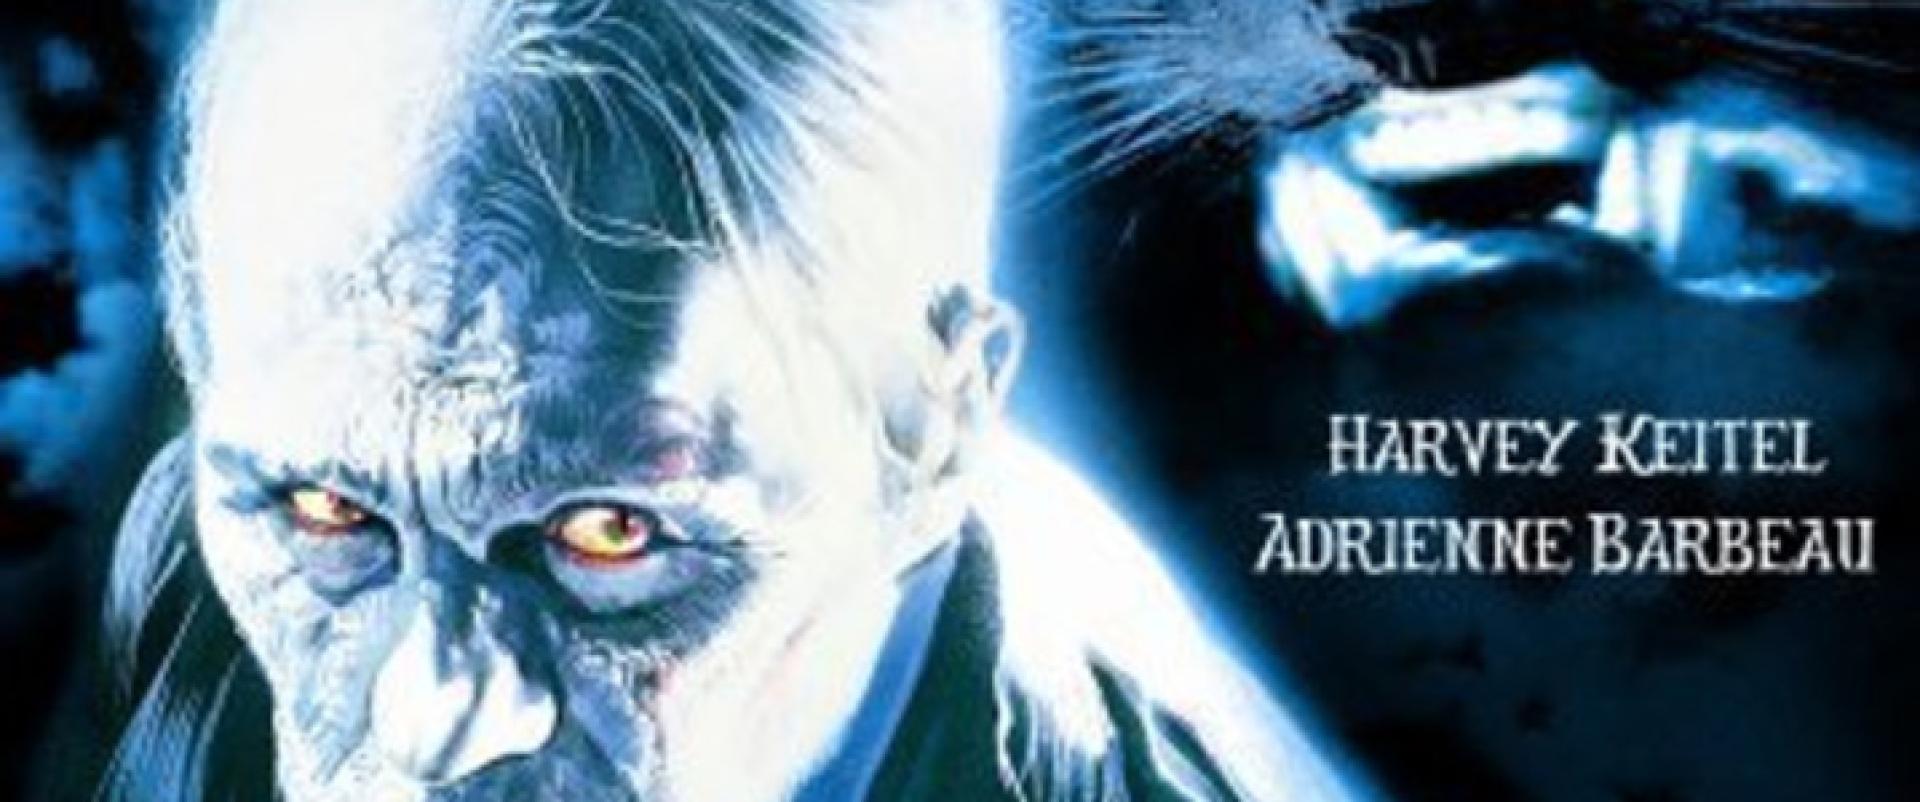 Due occhi diabolici - Két gonosz szem (1990)